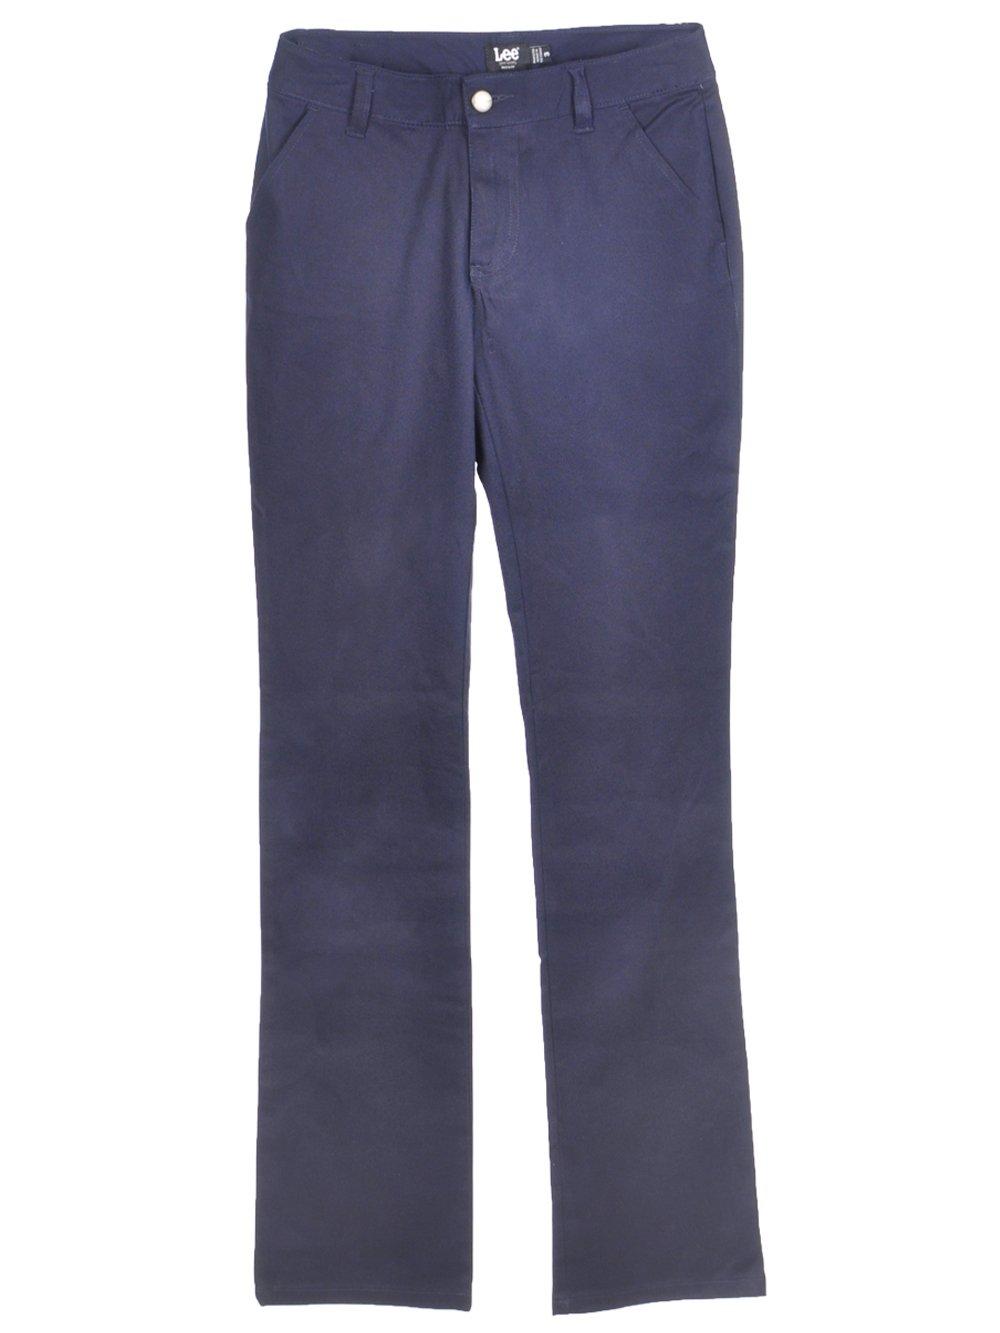 LEE Uniforms Juniors Curvey Straight Leg Pant, Navy, 13